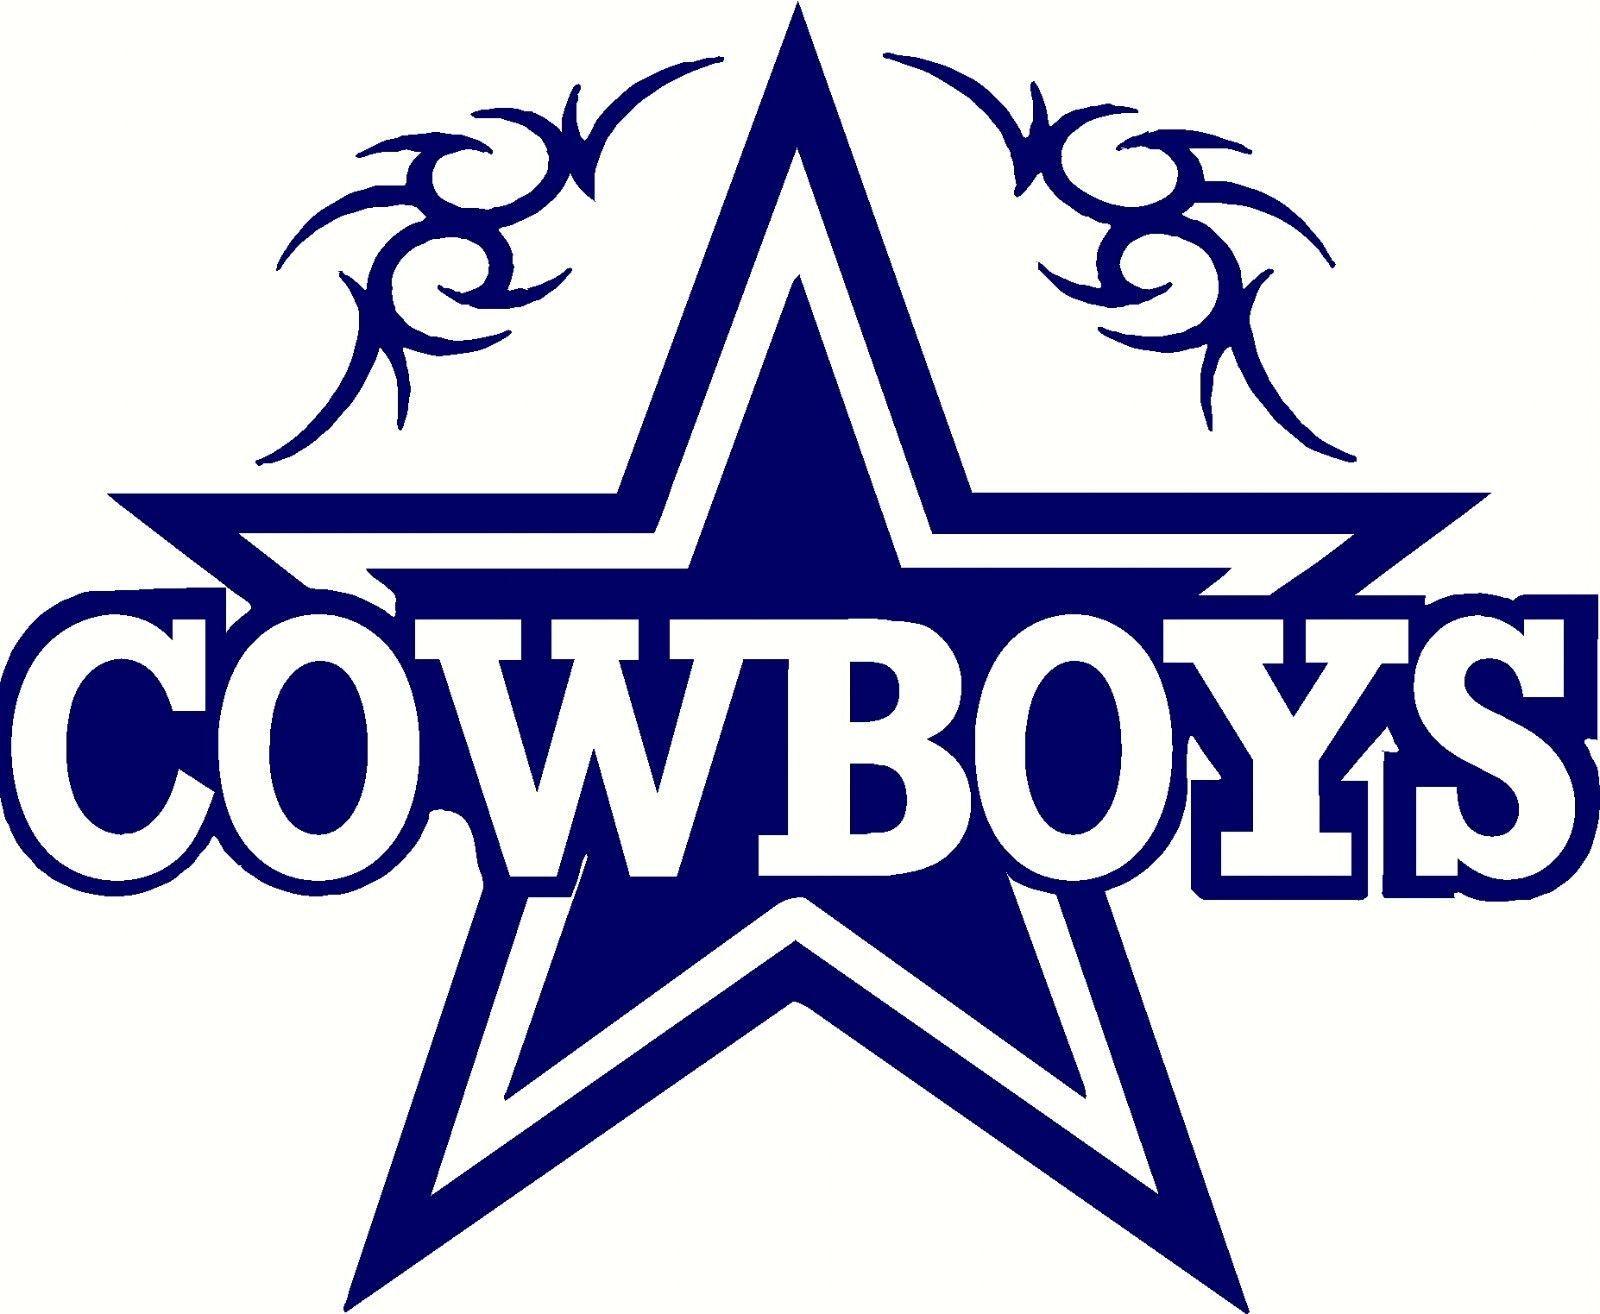 Dallas Cowboys Clipart Clip Art - Dallas Cowboys Star Logo Decal - HD Wallpaper